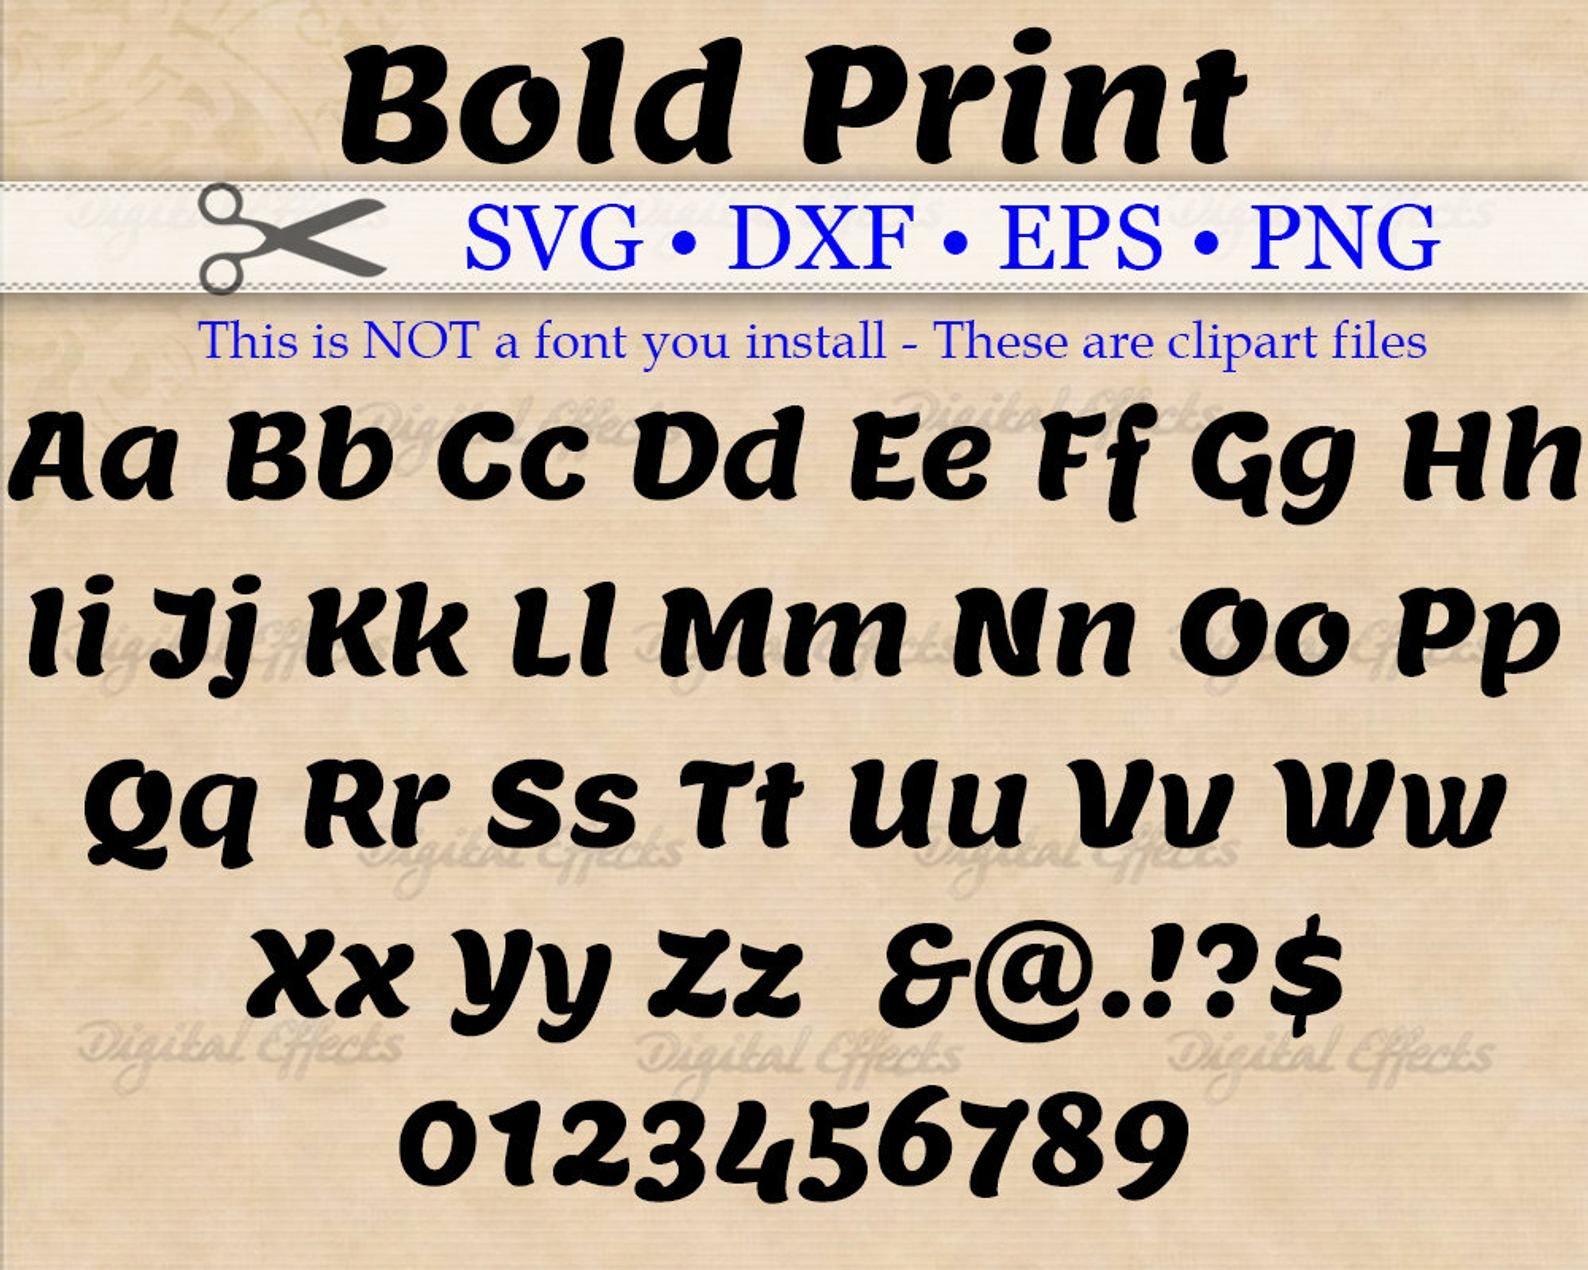 BOLD PRINT Monogram Svg Dxf Eps Png Files Bold Retro